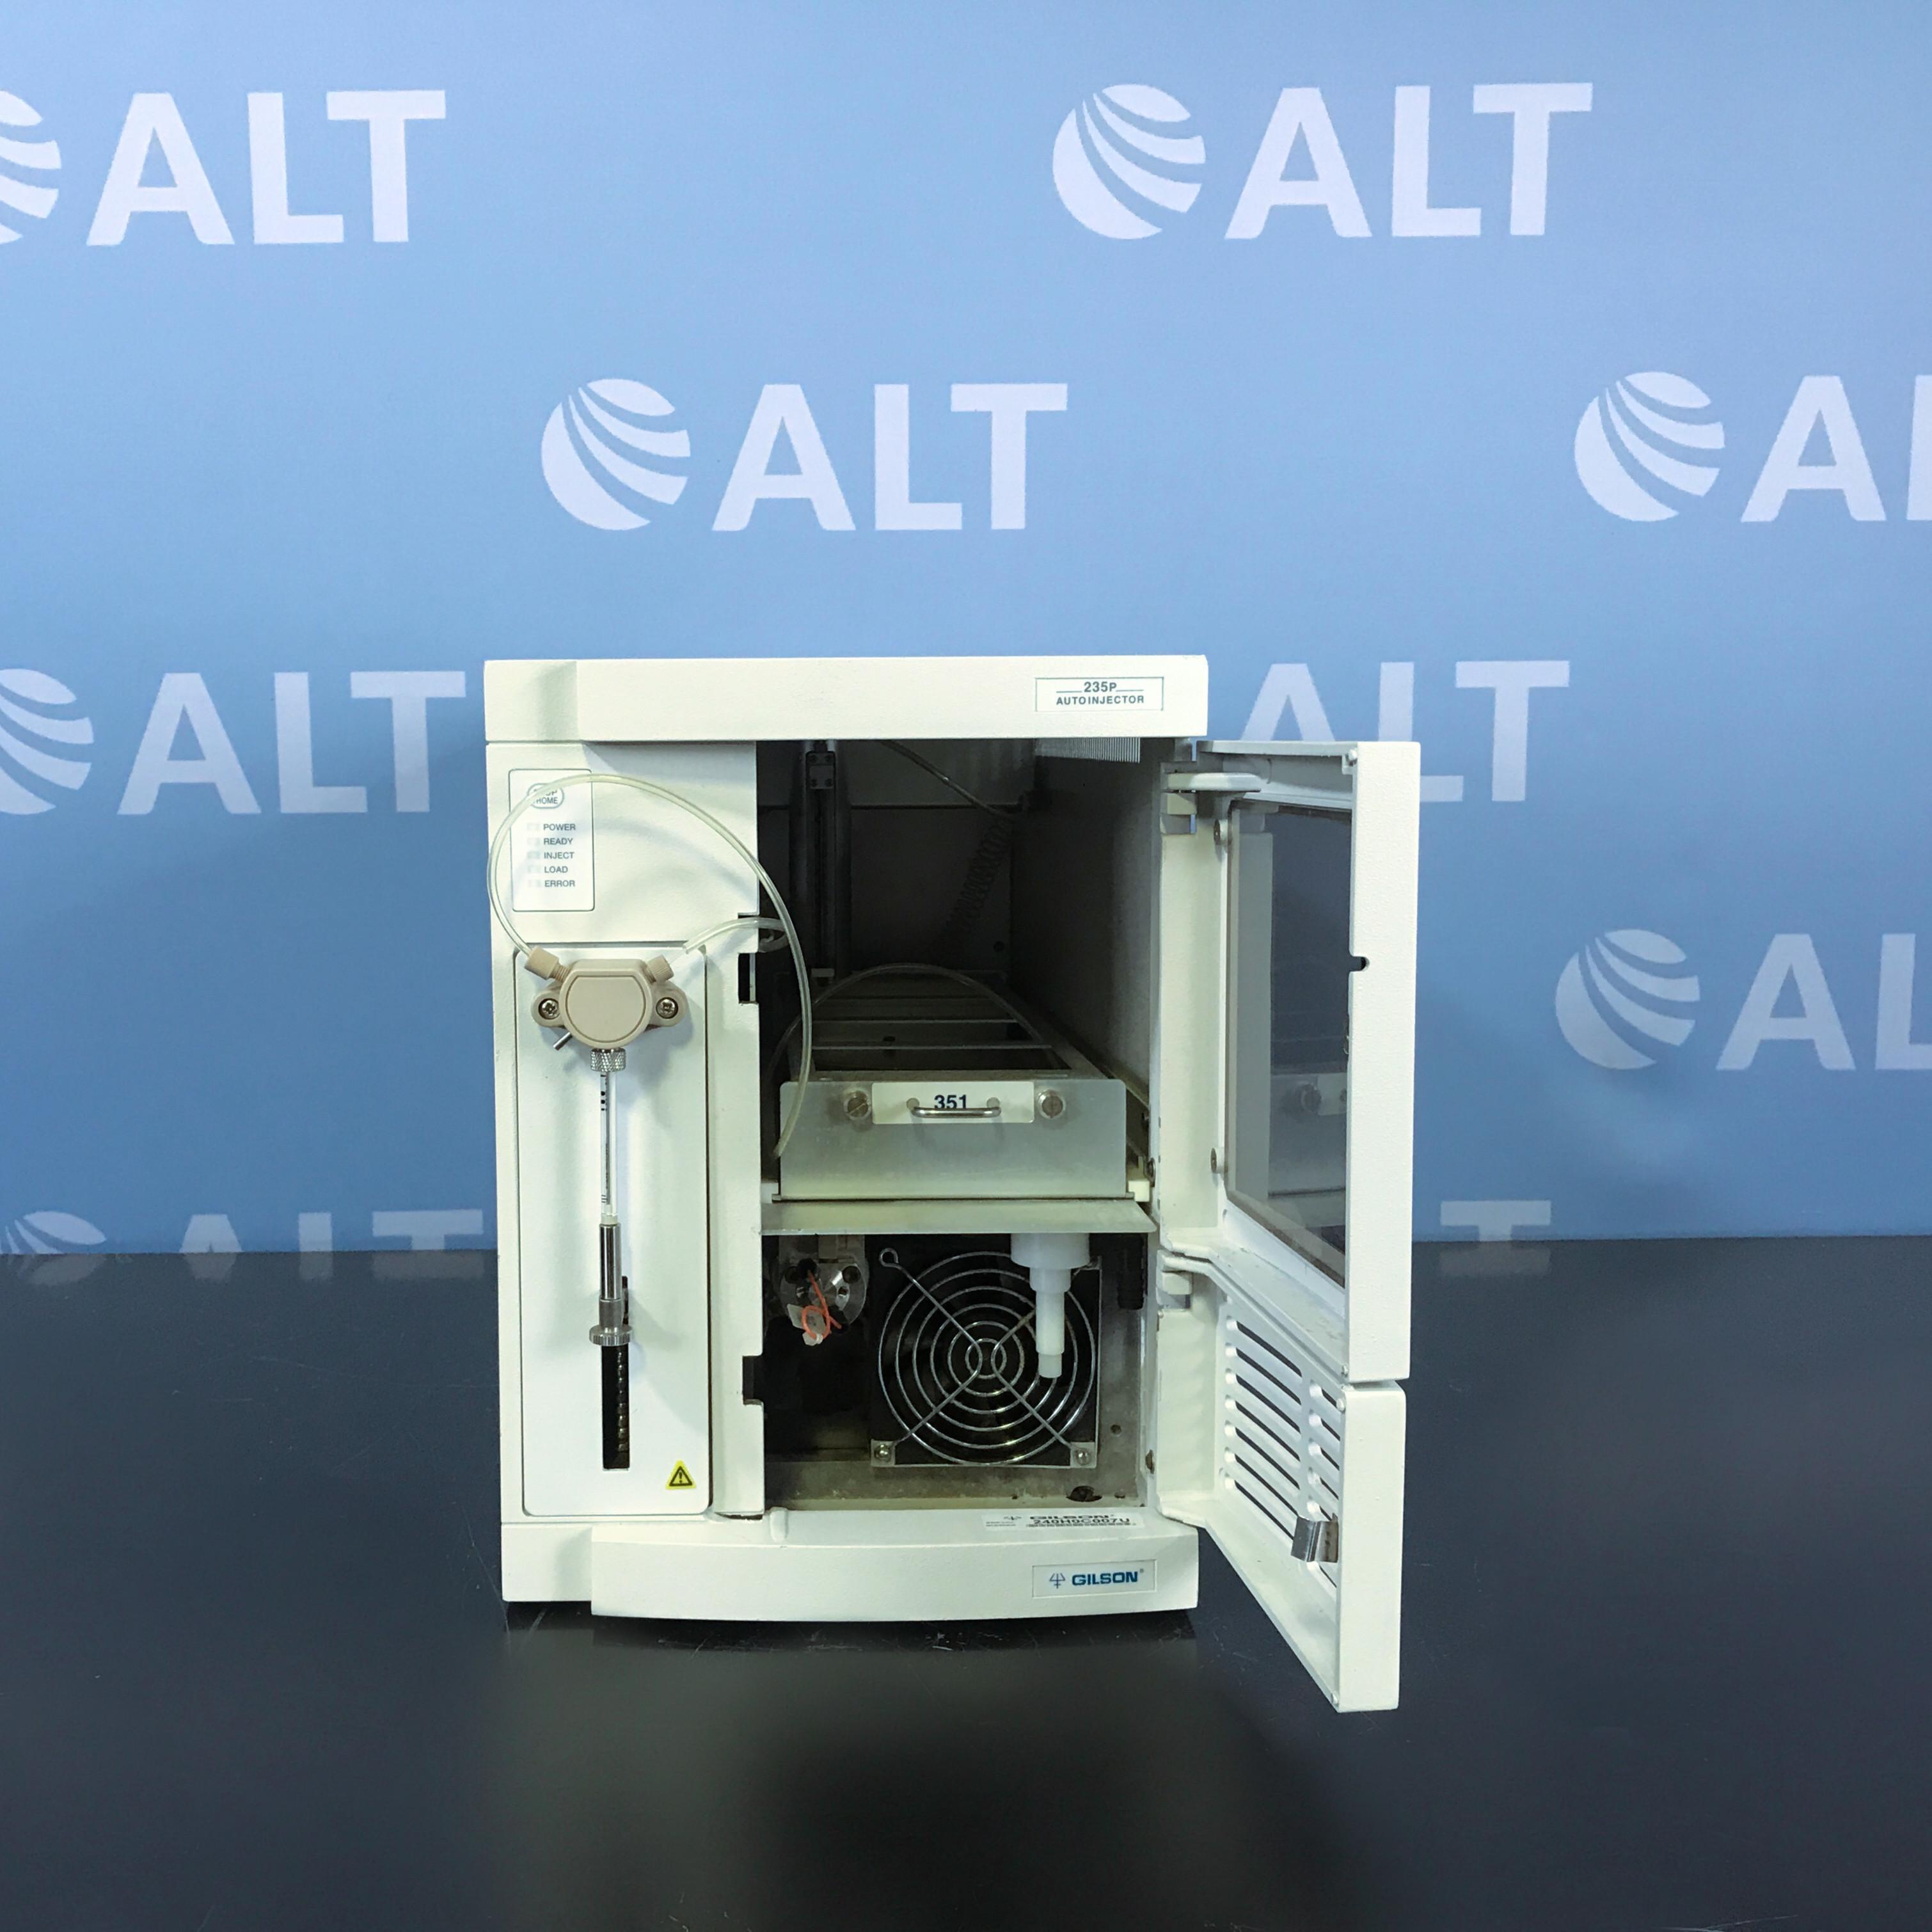 Gilson 235P Auto Injector Image